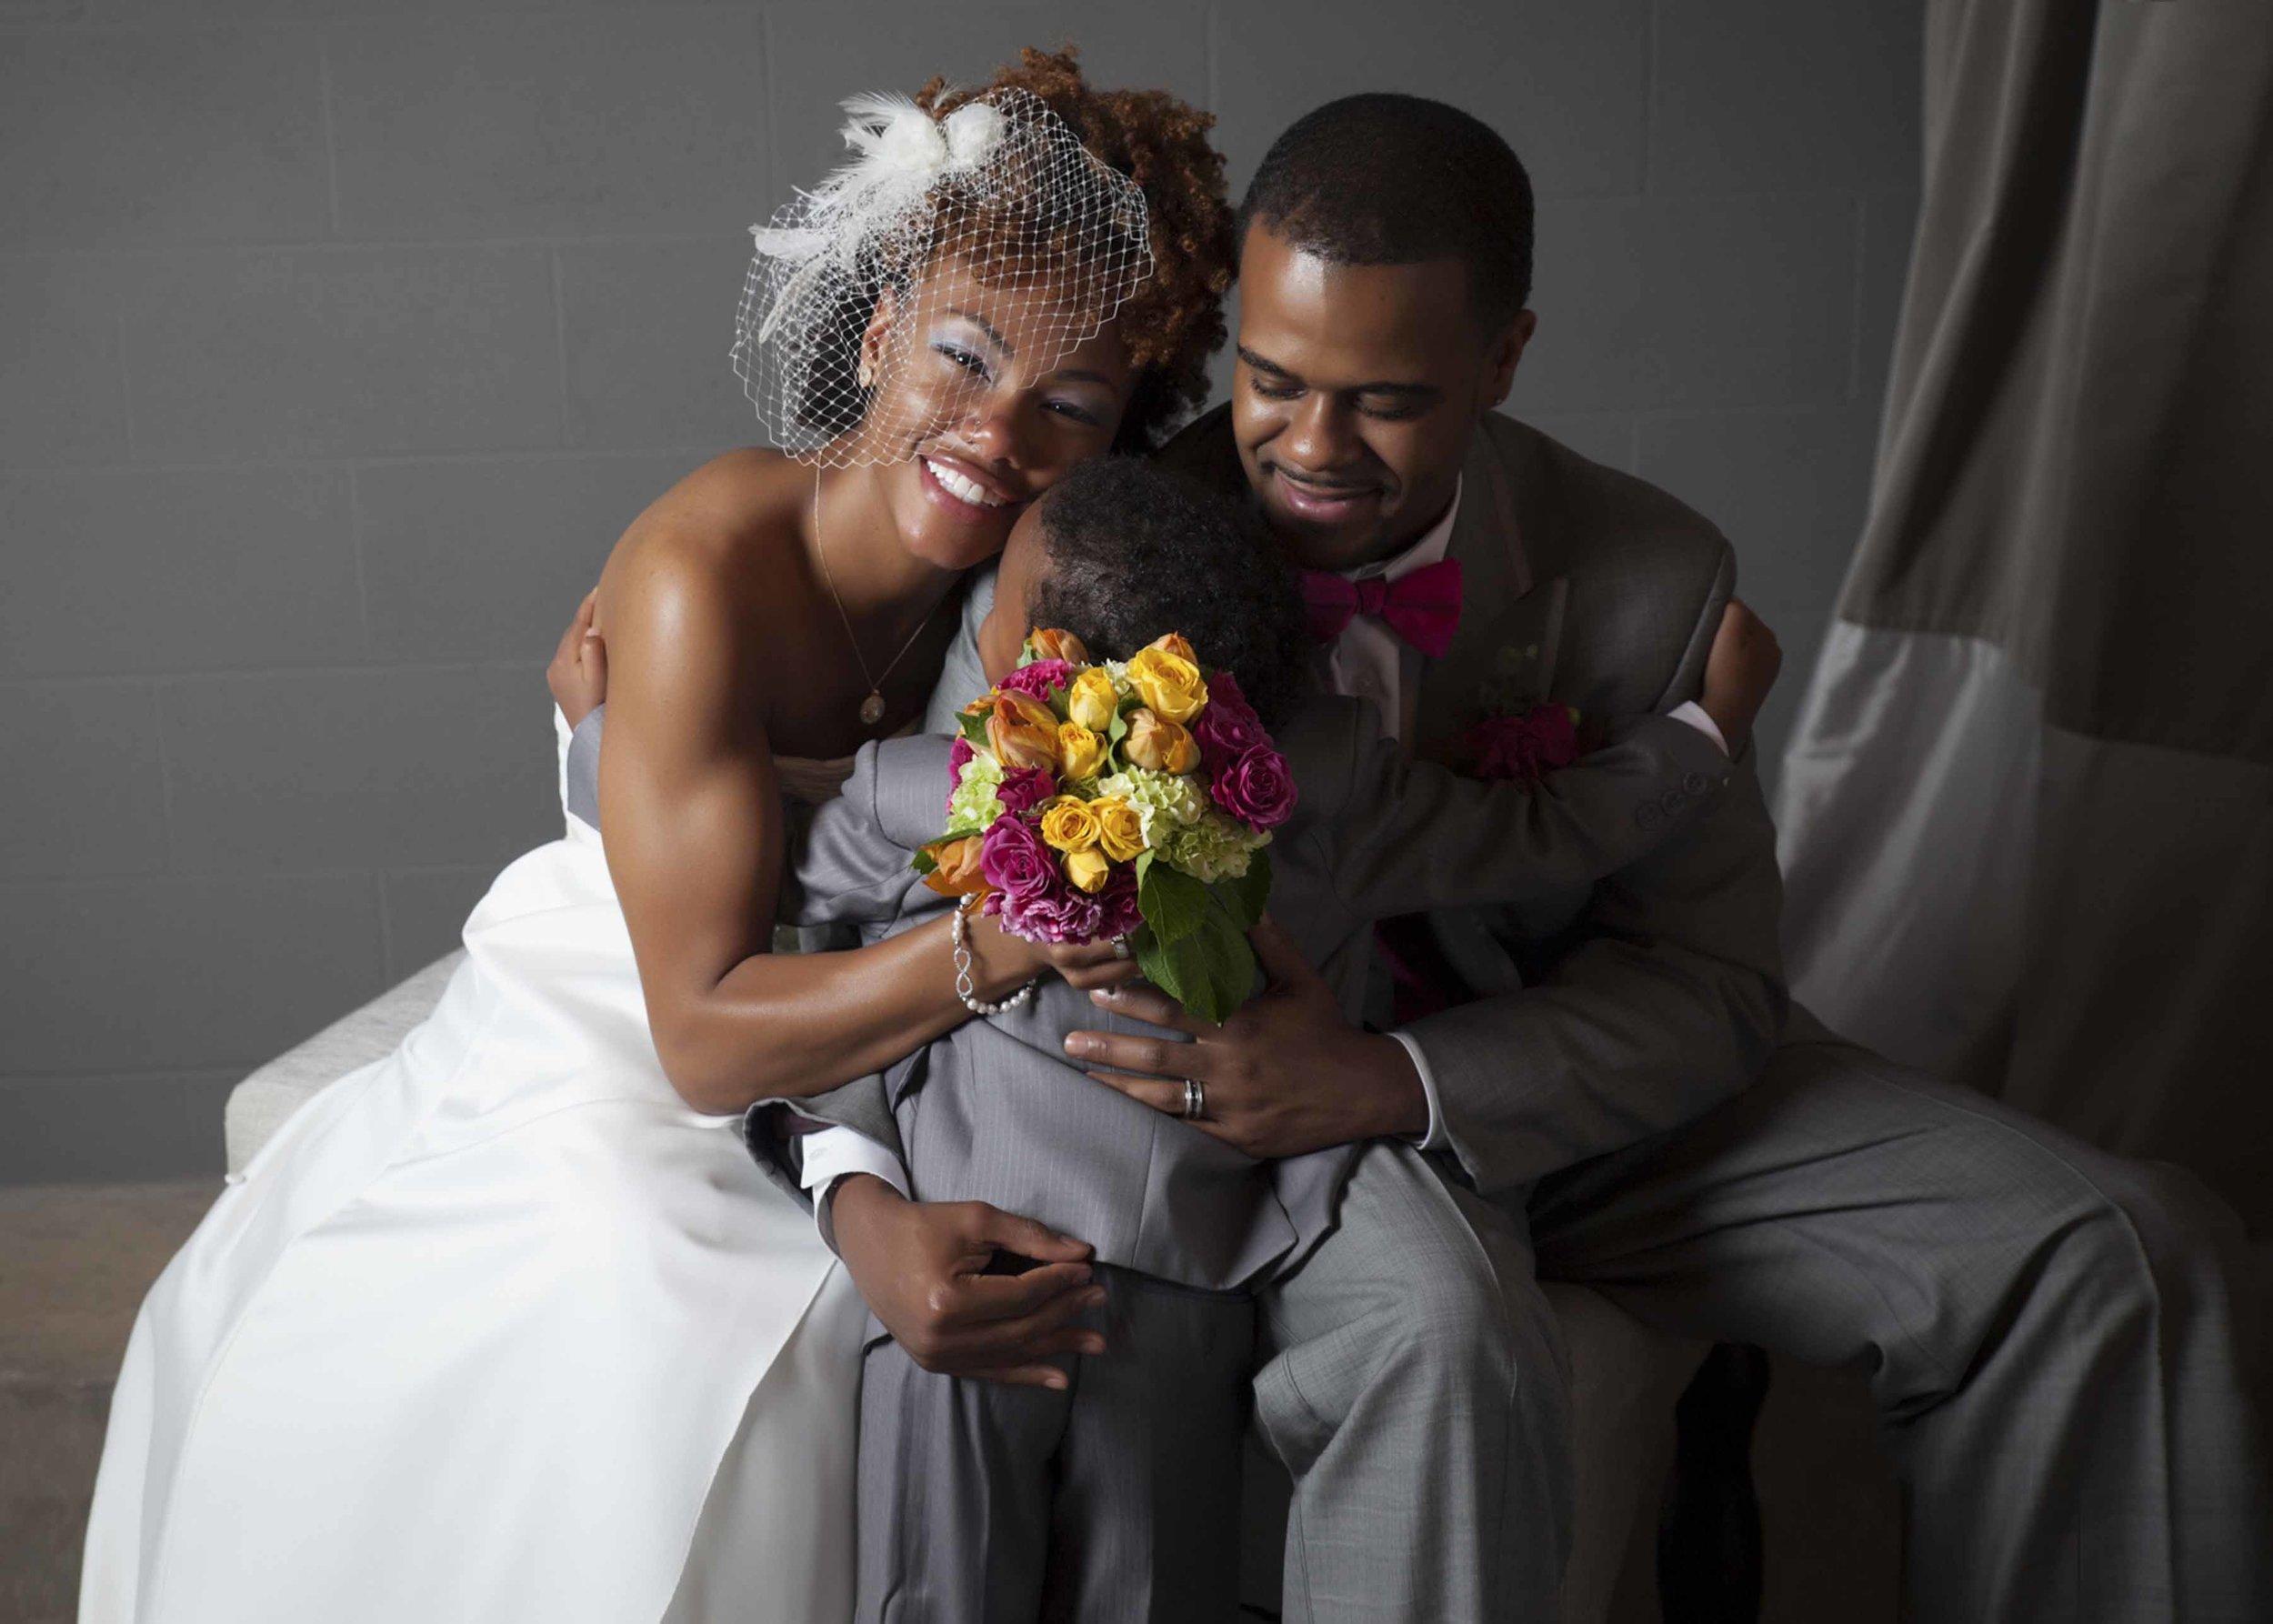 cheap-weddings-kansas-city.jpg